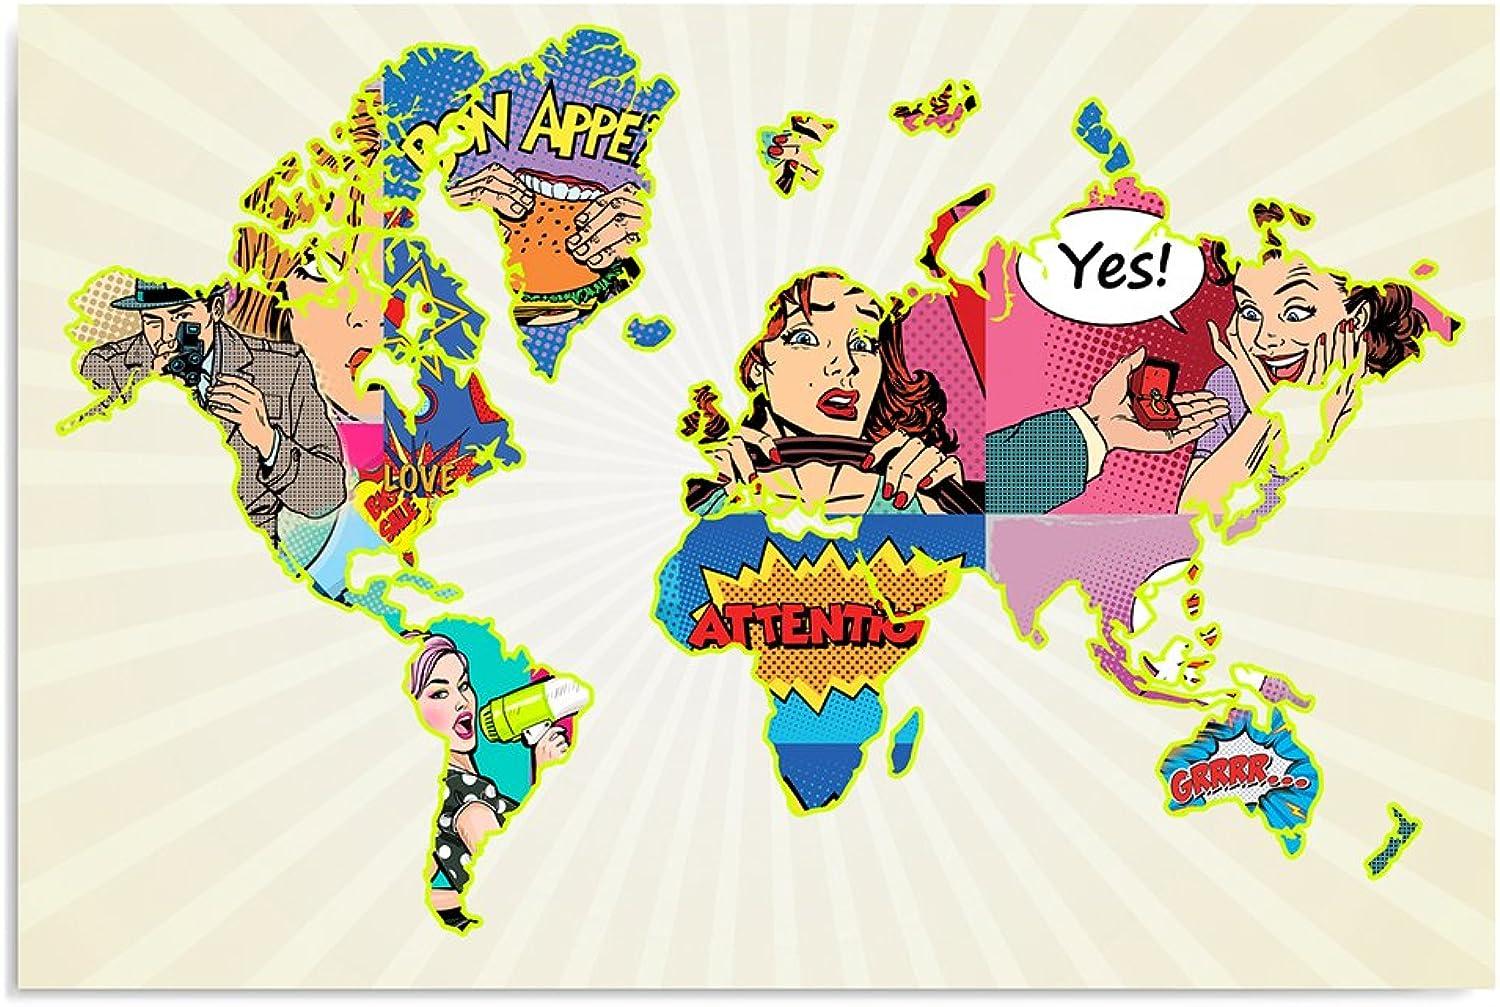 Feeby, Leinwandbild, Bilder, Wand Wand Wand Bild, Wandbilder, Kunstdruck 80x120cm, Weltkarte, POP-Art, WEIß, MEHRFARBEN B01MPVQO3C 538dd1